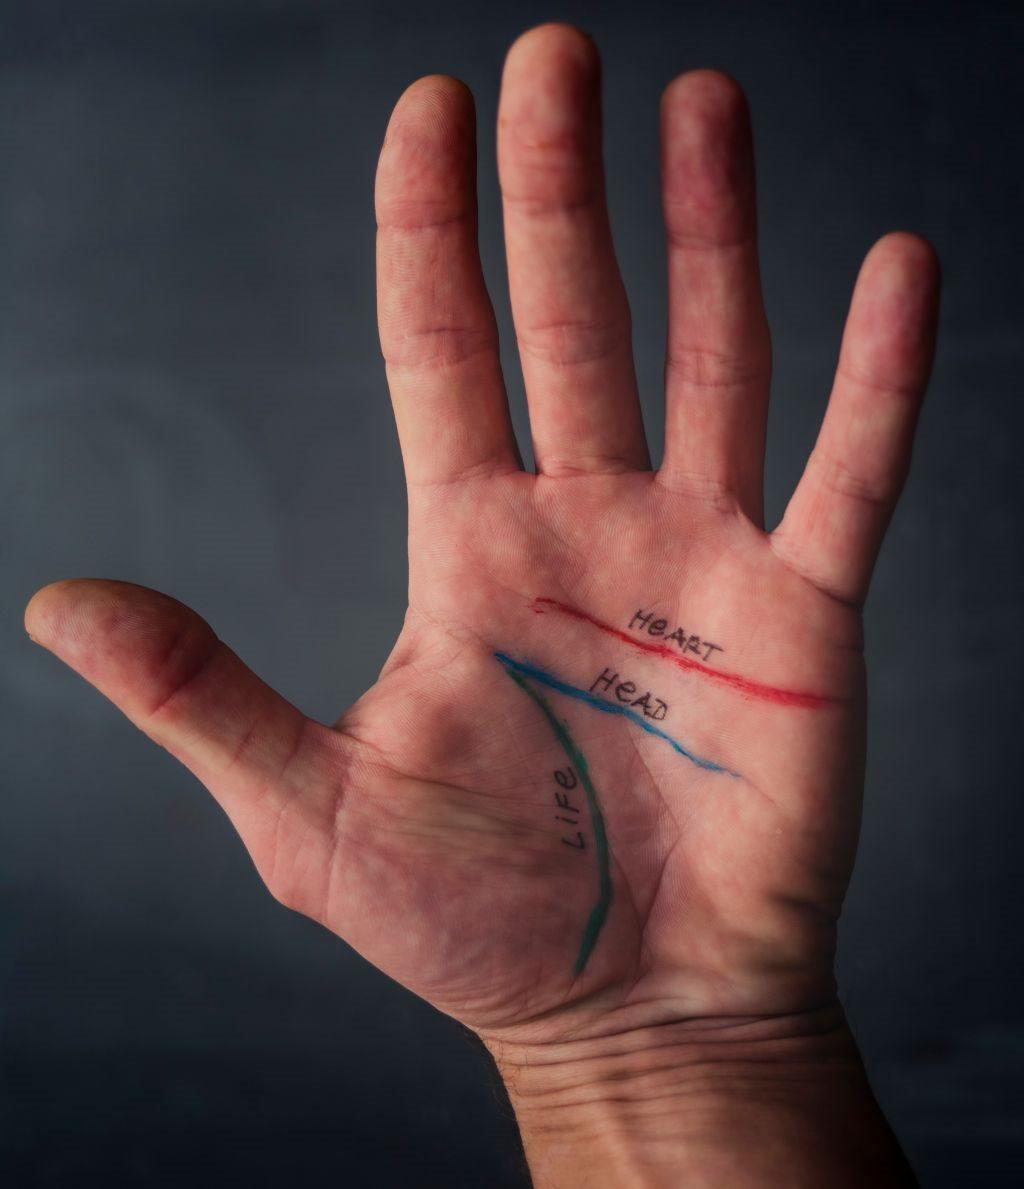 symbol,anatomy,thumb,caucasian,line,palm,concept,sign,skin,astro